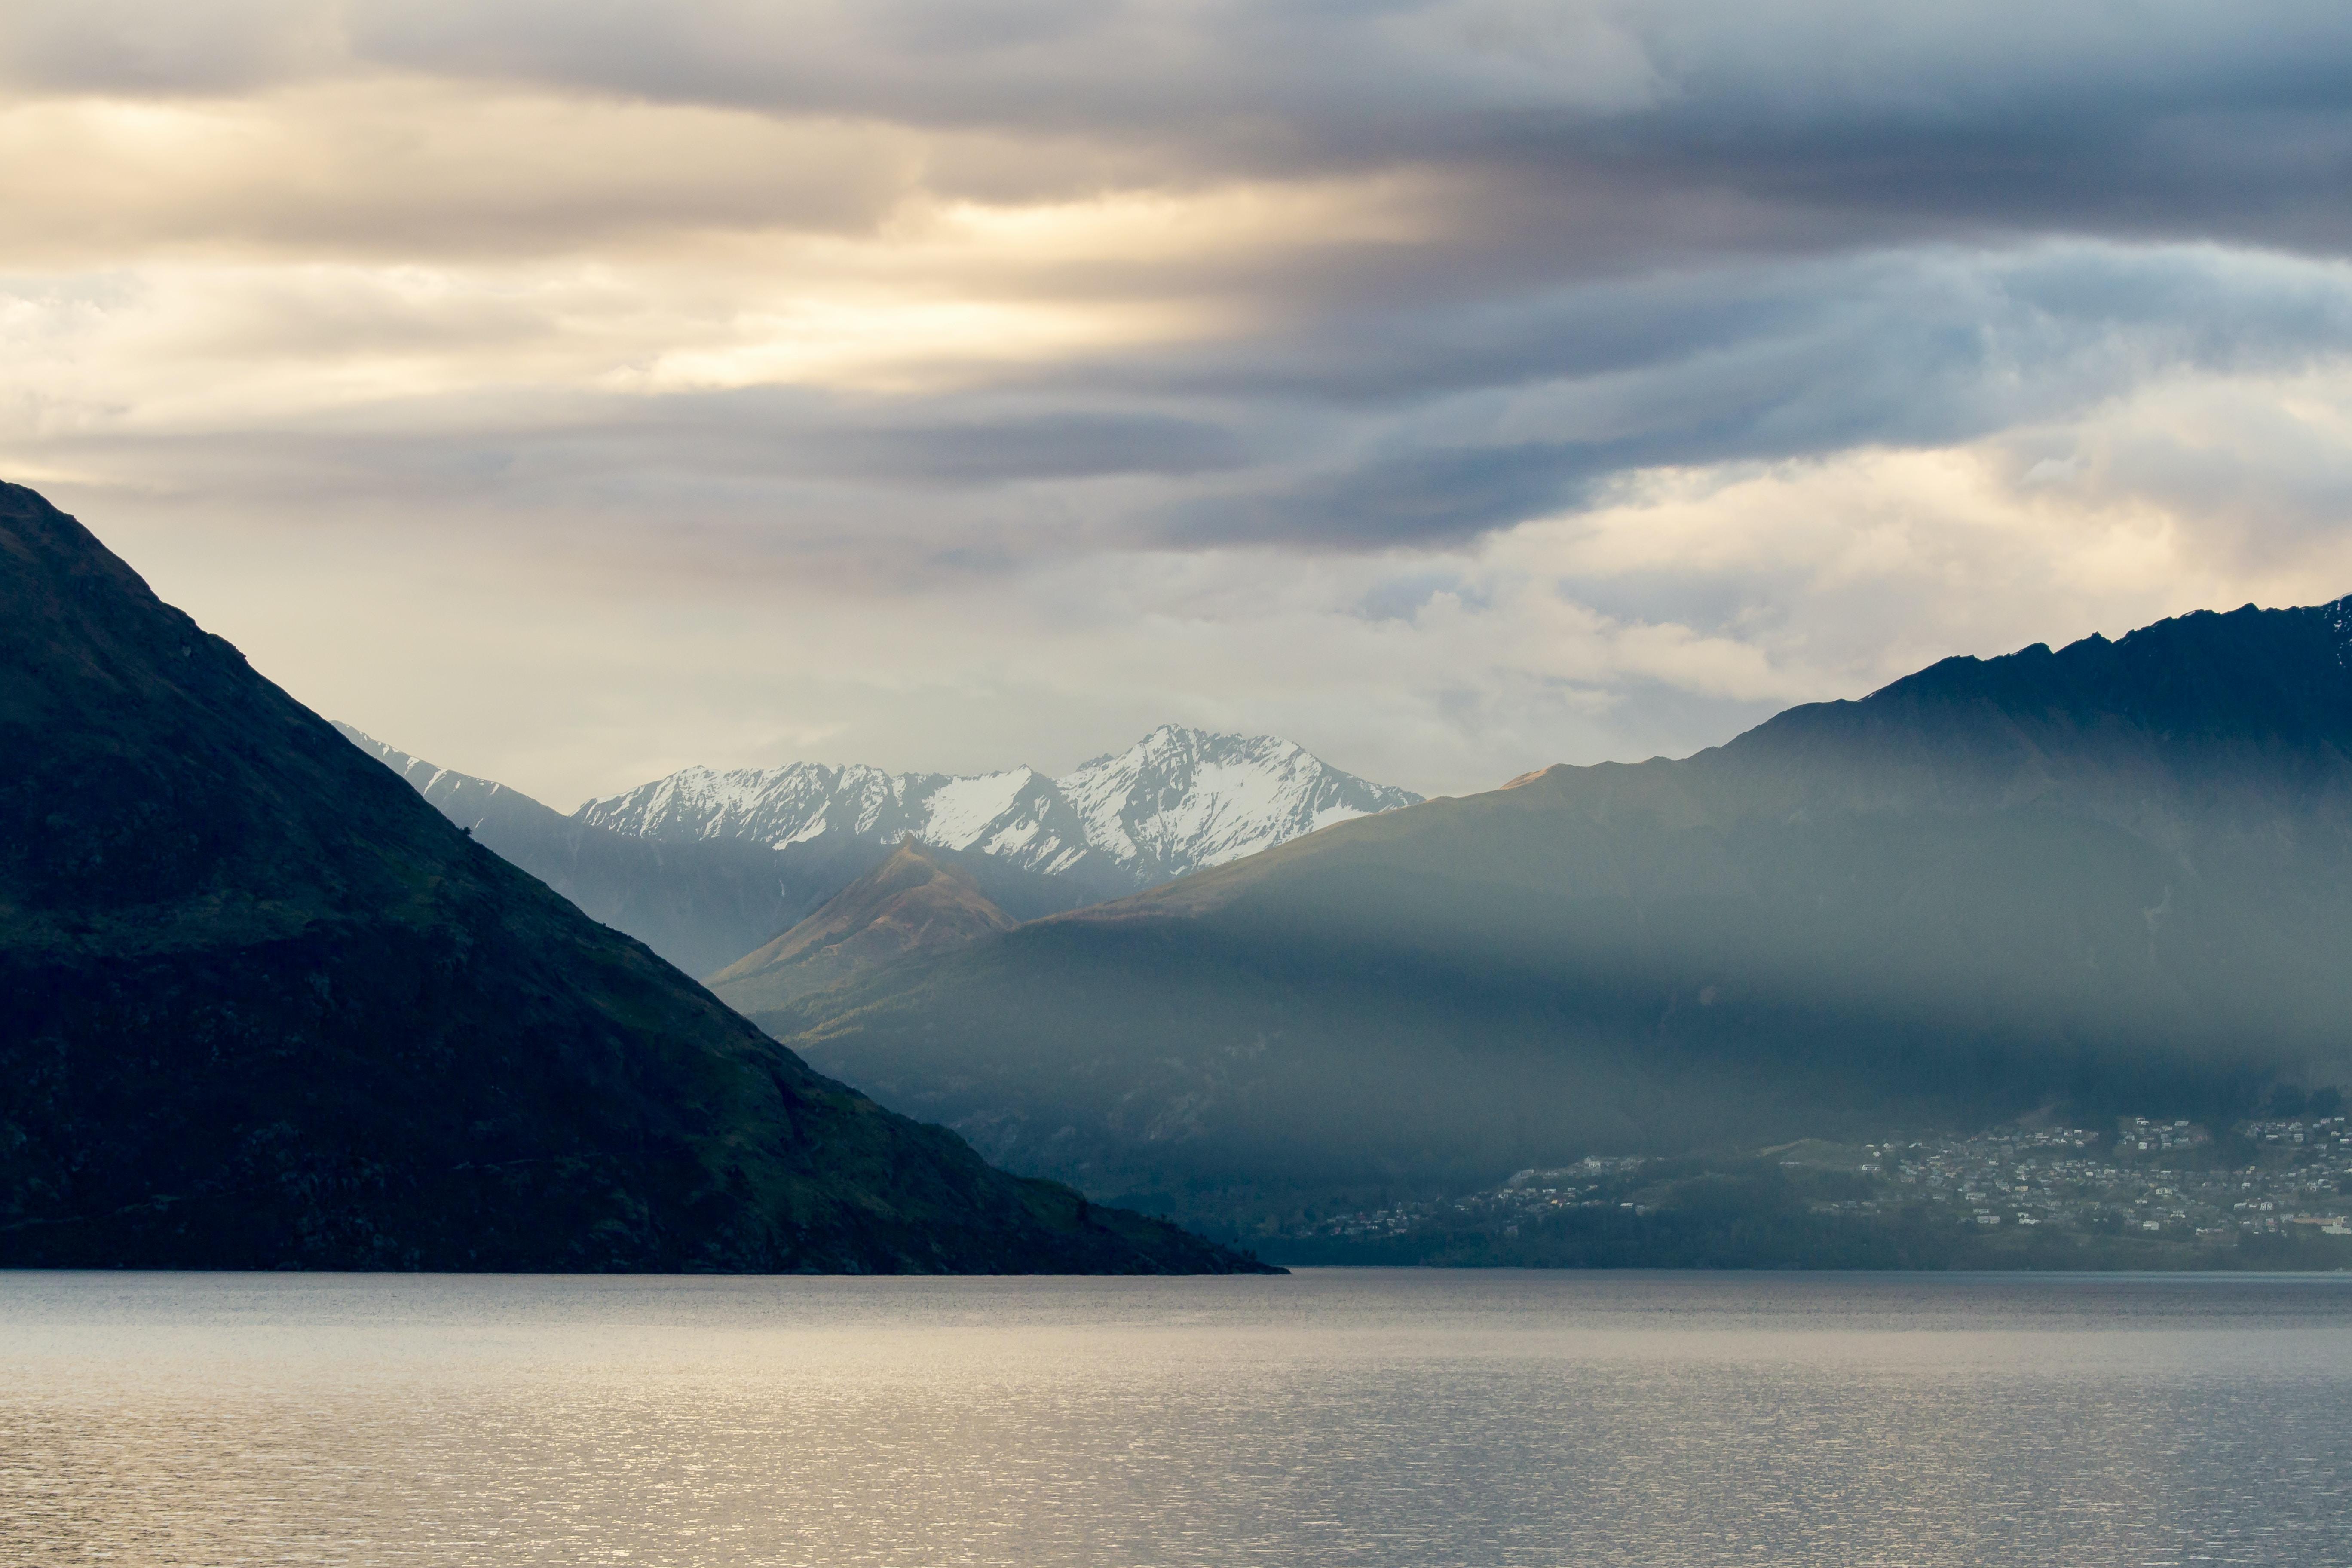 mountains and sea horizon scenery